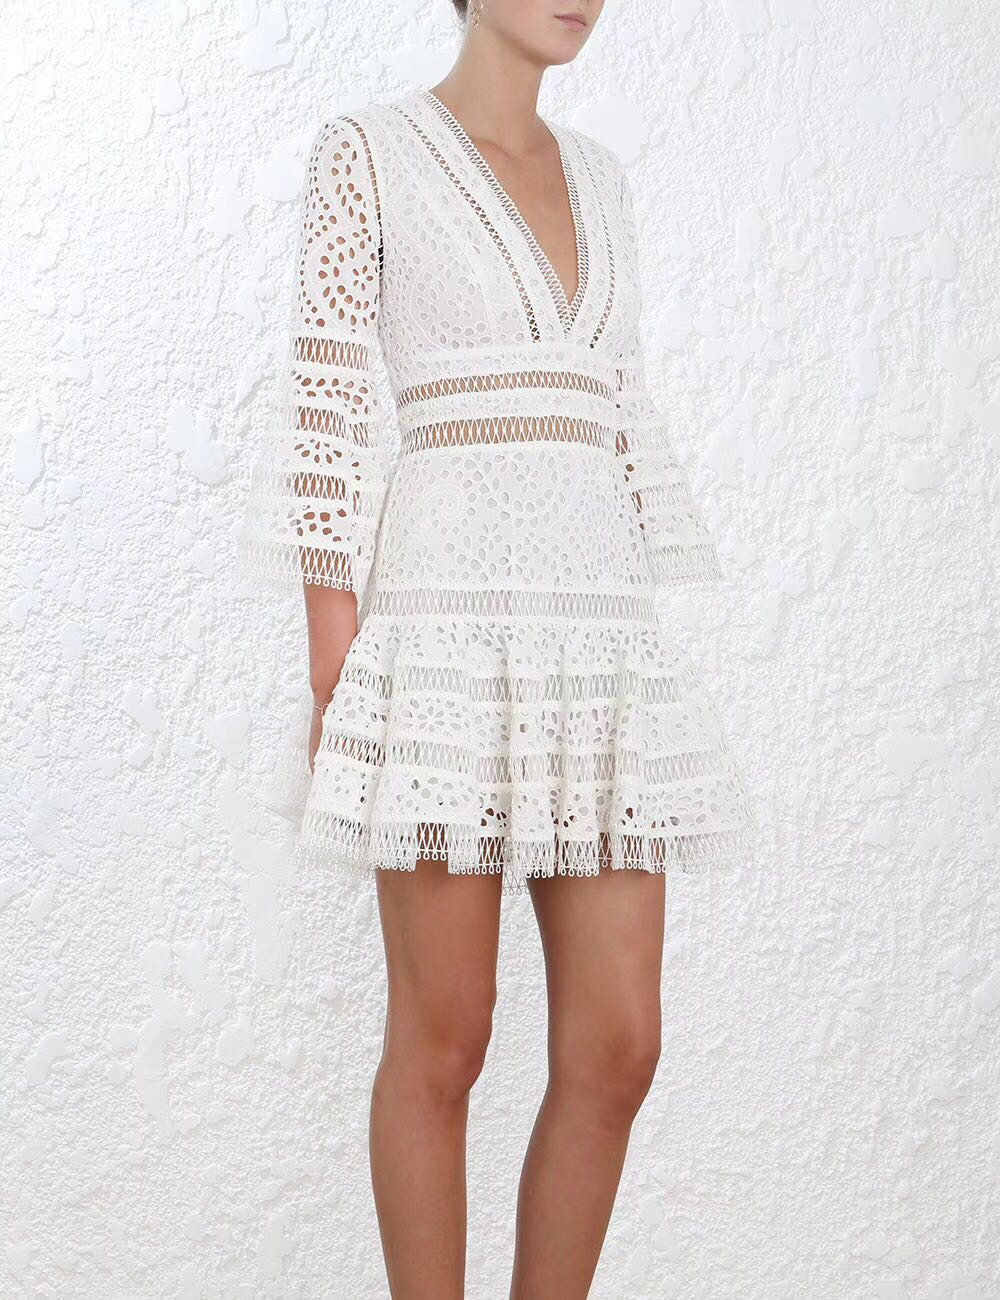 Women V neckline Nipped in Waist Fared Skirt Lovelorn Flutter Cotton broderie Anglaise Mini Dress A line Floral Lace Mini Dress